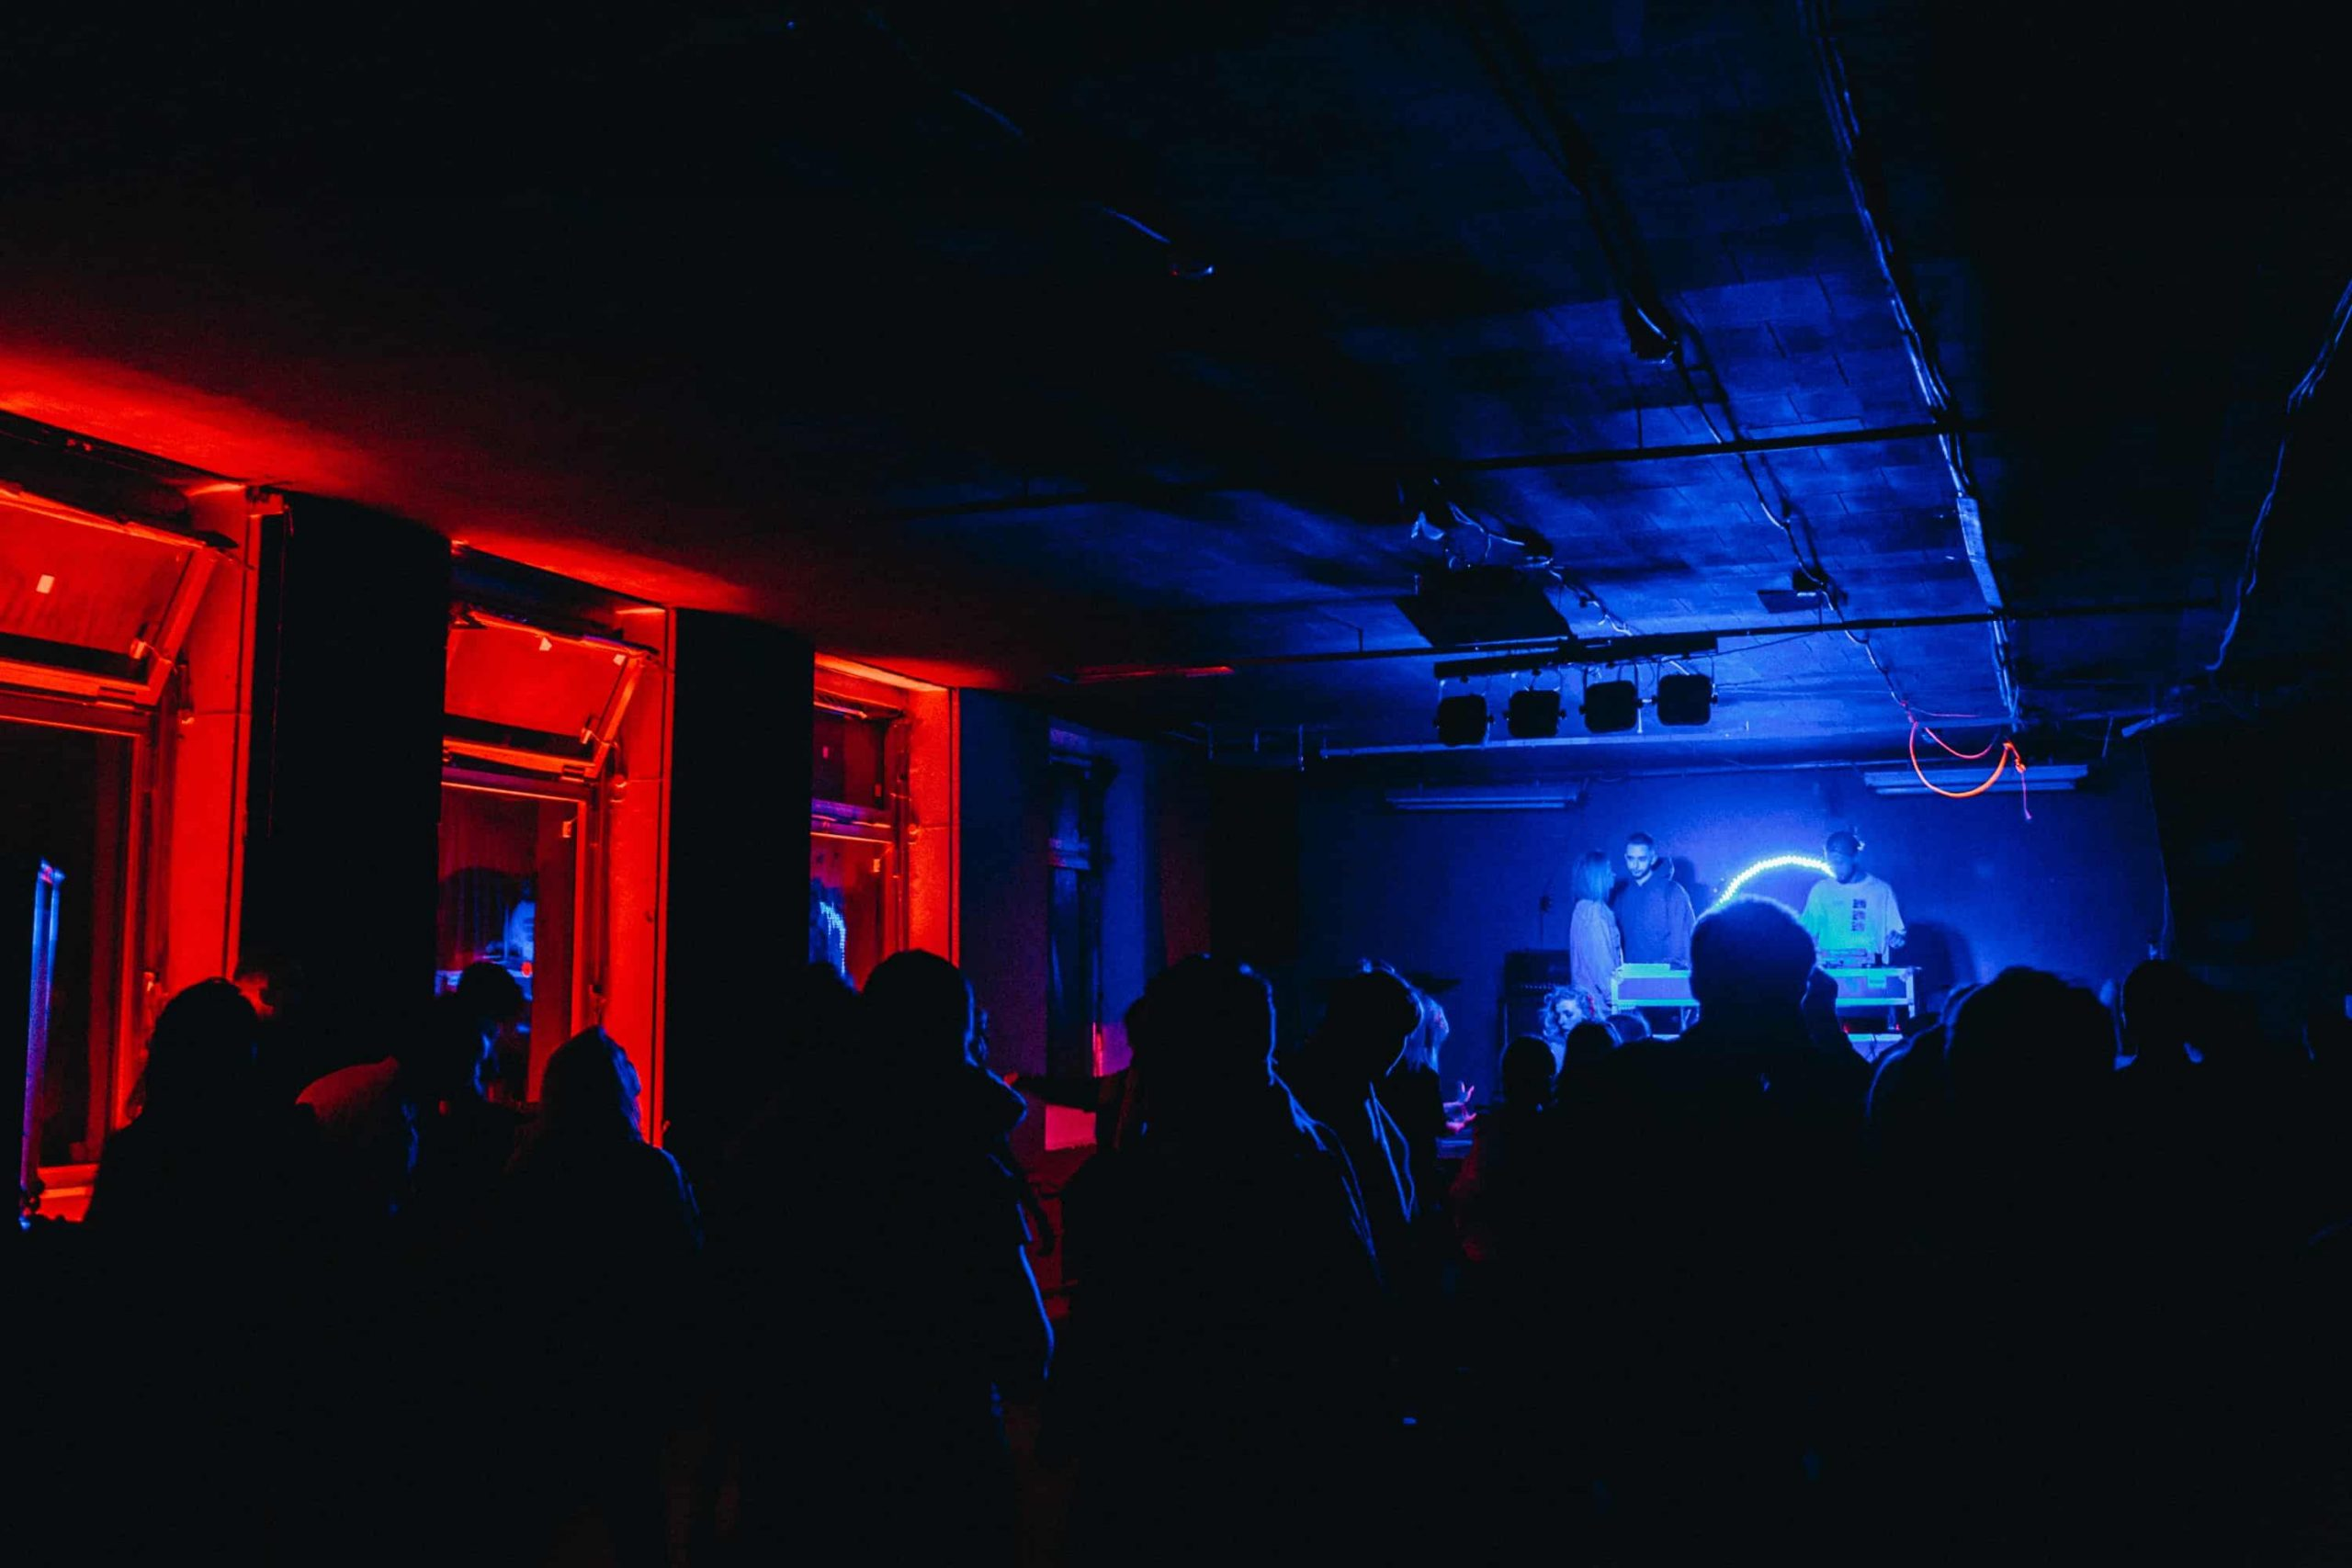 Nightlife crowd Alexander Popov